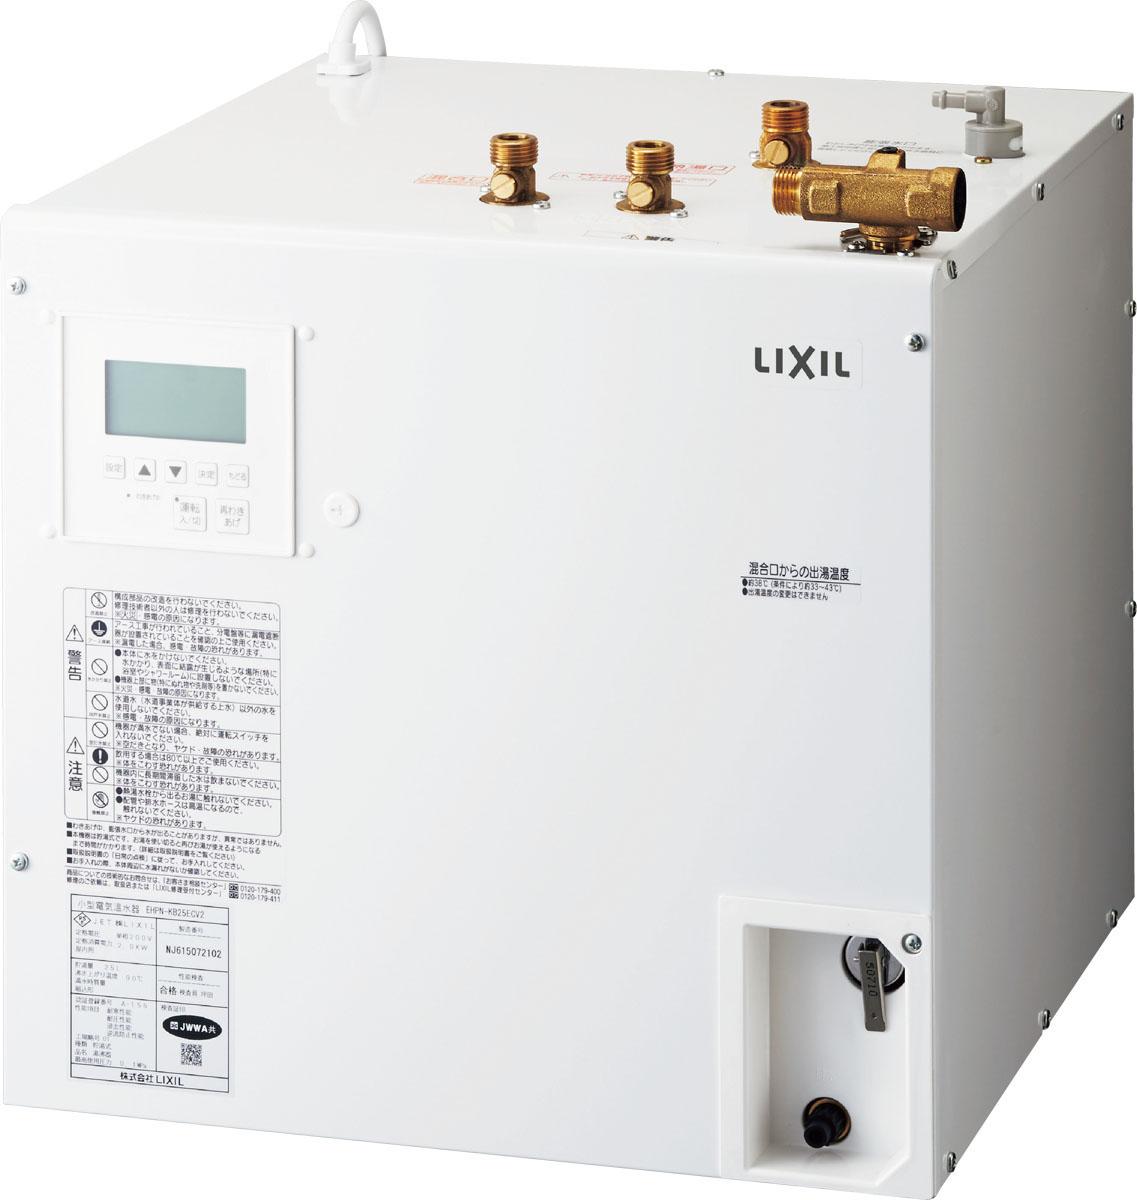 INAX/LIXIL 小型電気温水器【SEHPNKB25ECV2A3】ゆプラス ミニキッチン対応 間口105cm 飲料・洗い物用 単相200V タンク容量25L